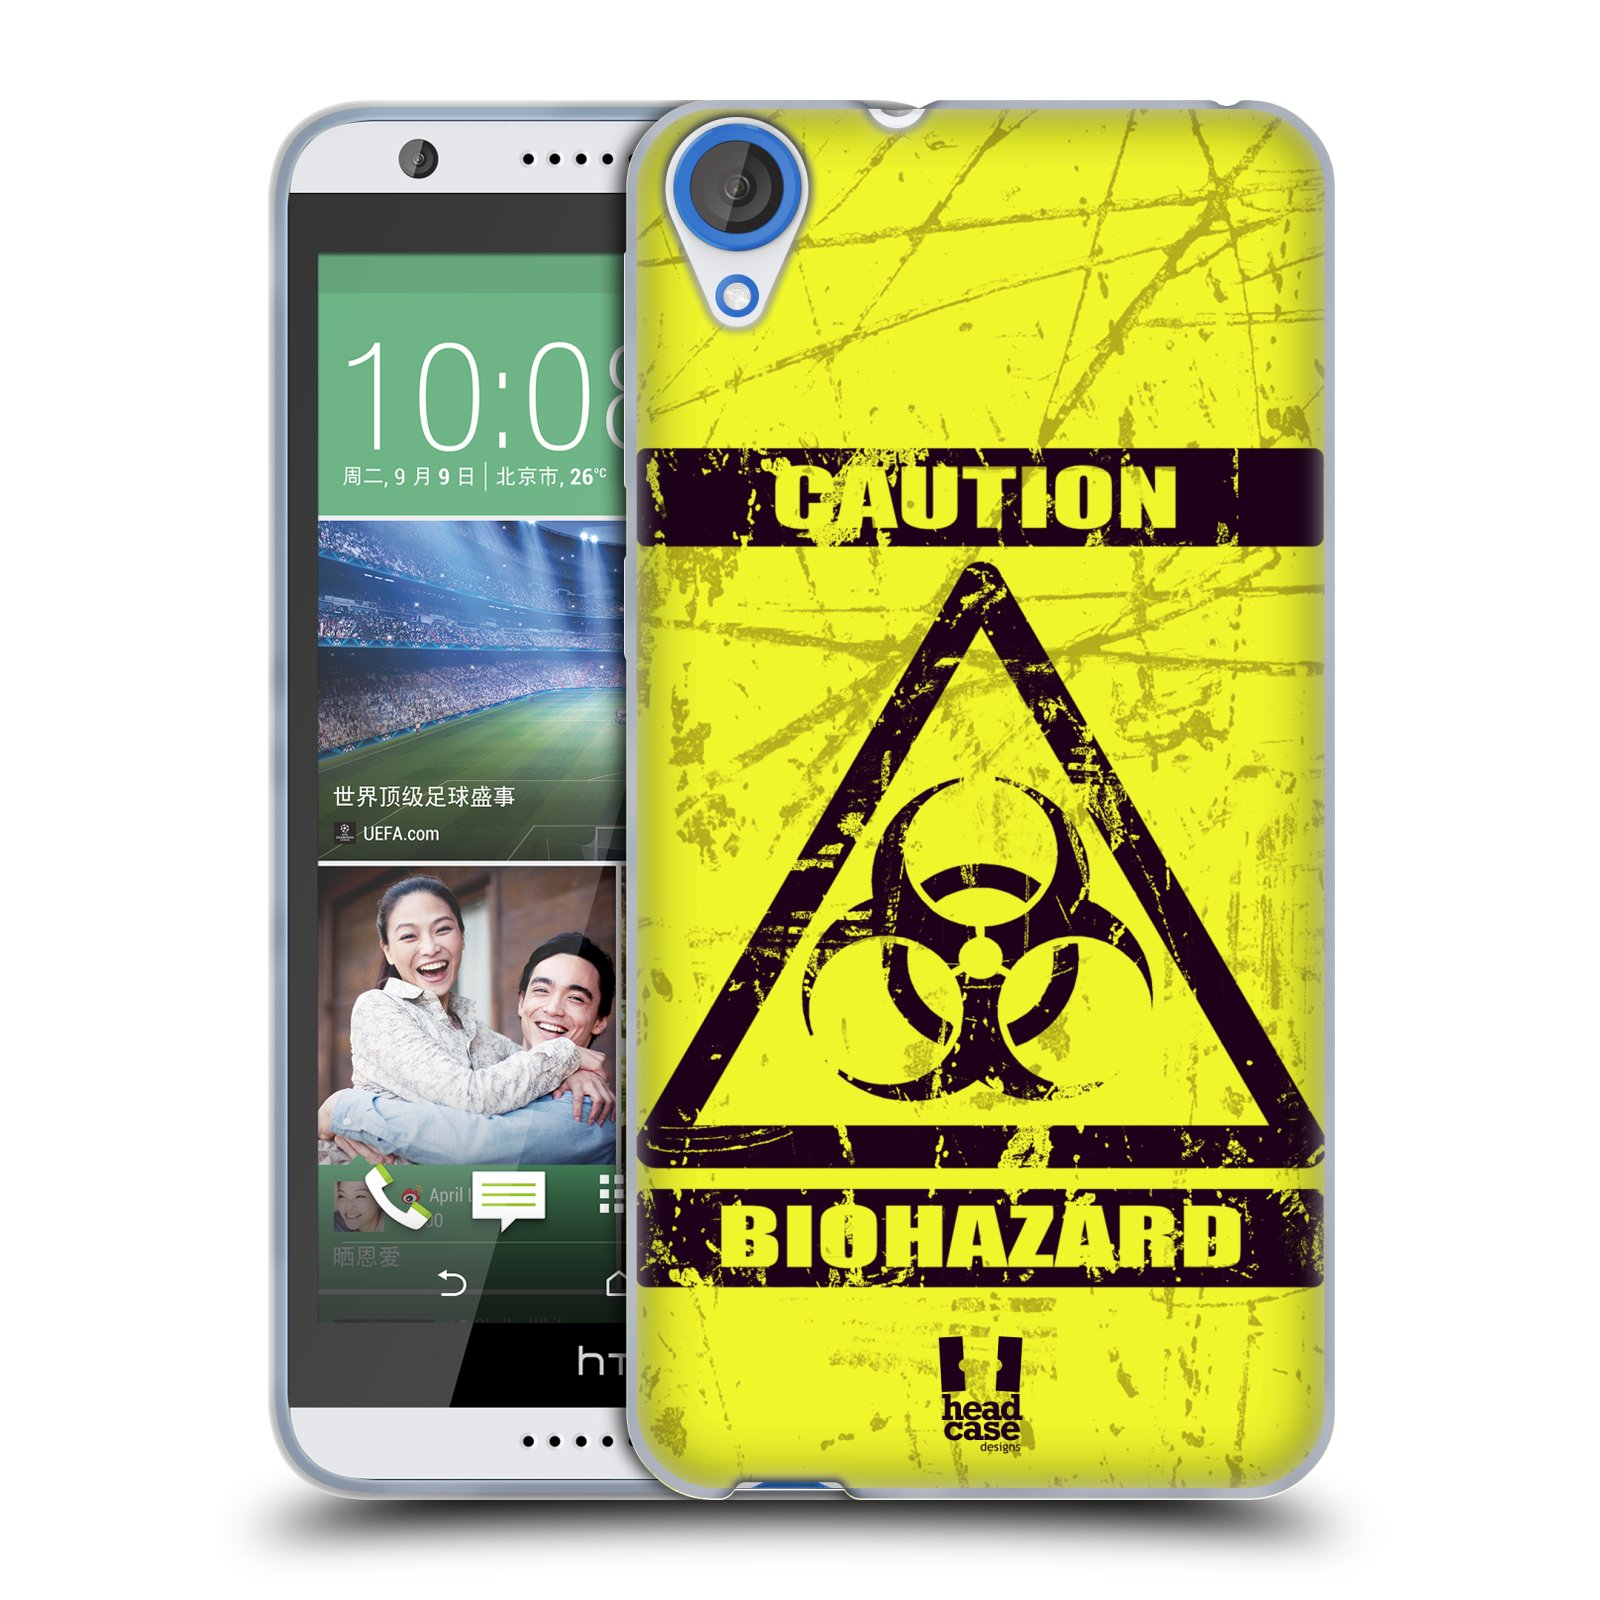 Silikonové pouzdro na mobil HTC Desire 820 HEAD CASE BIOHAZARD (Silikonový kryt či obal na mobilní telefon HTC Desire 820)